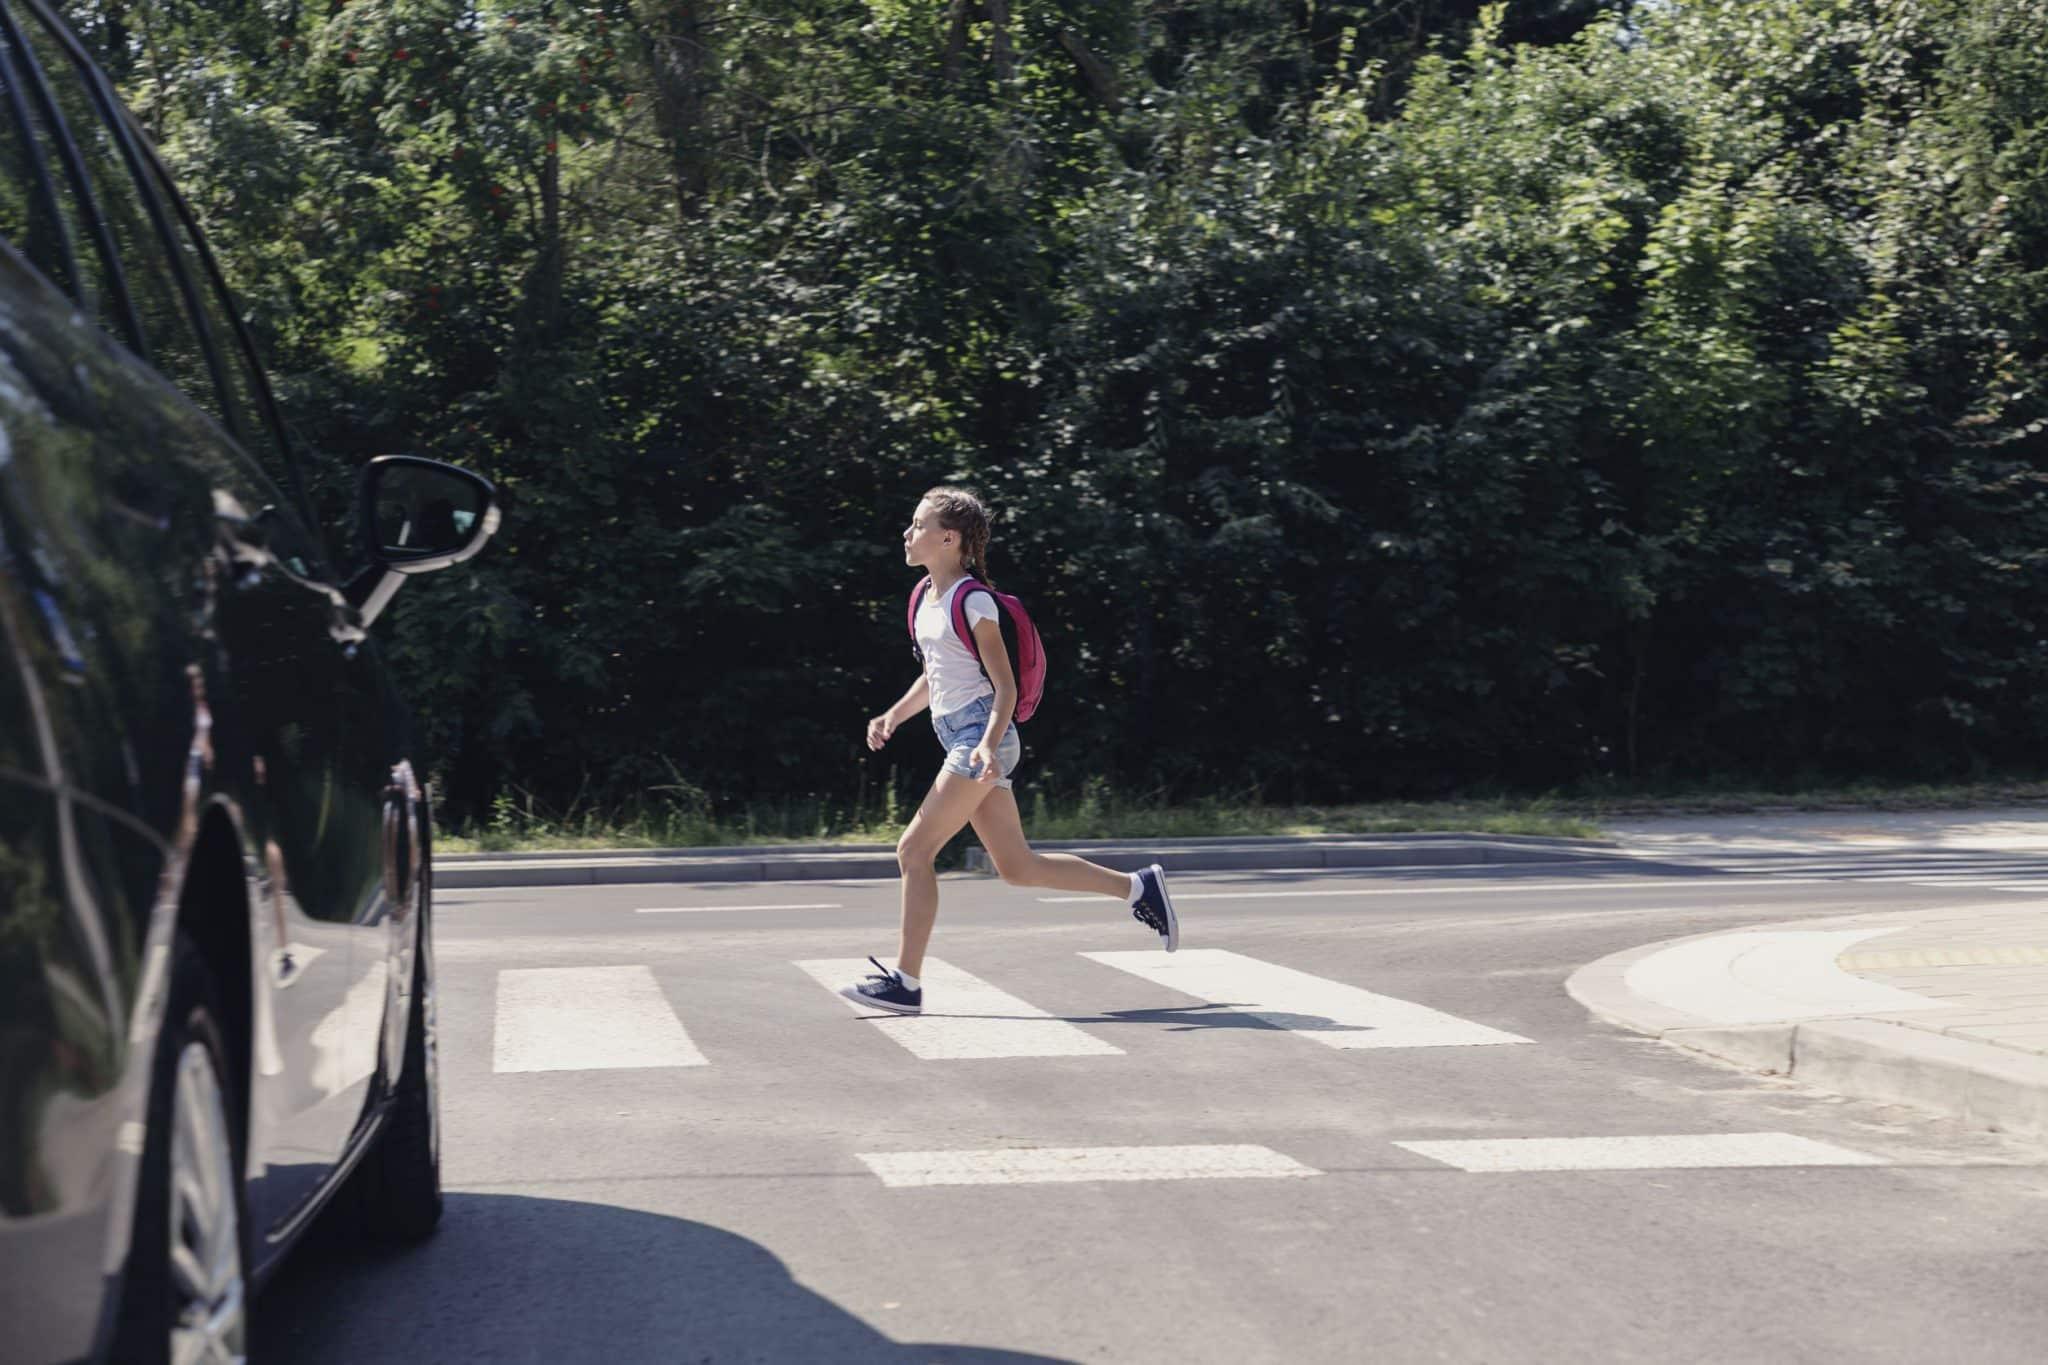 Girl pedestrian walking through a crosswalk